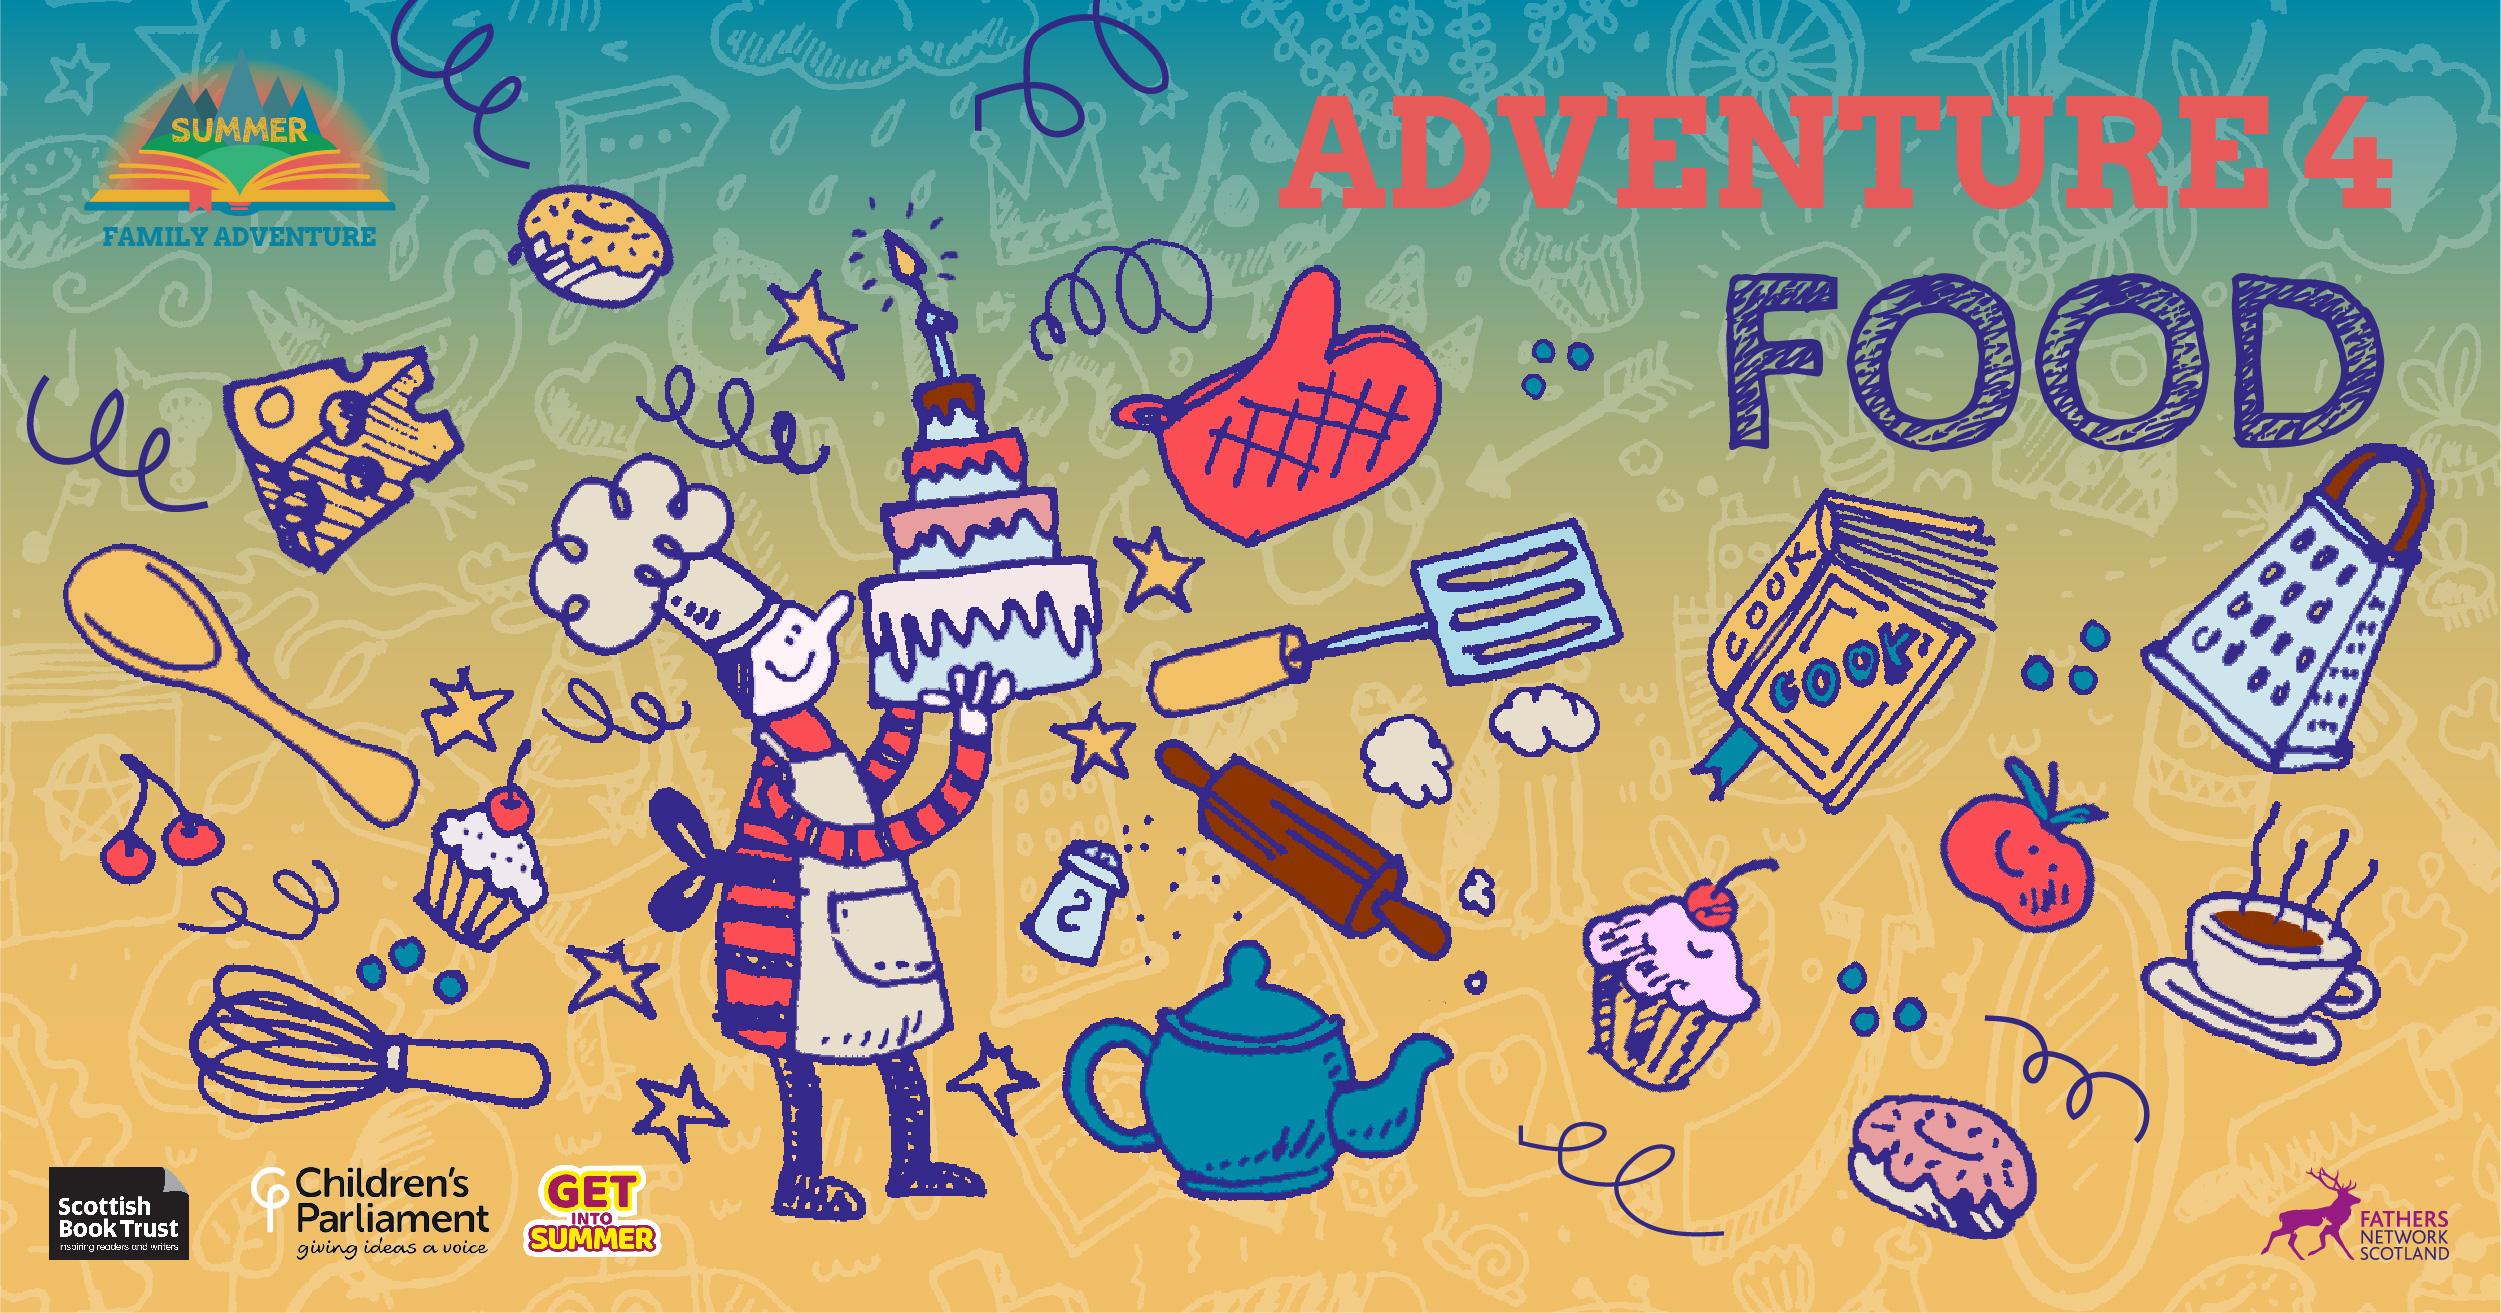 Summer Adventure 4